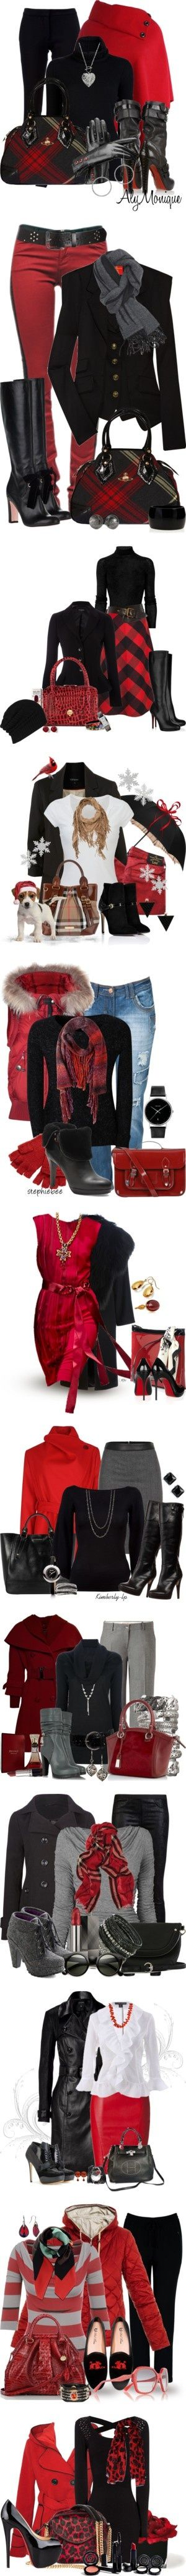 .I like the purse and the reds.